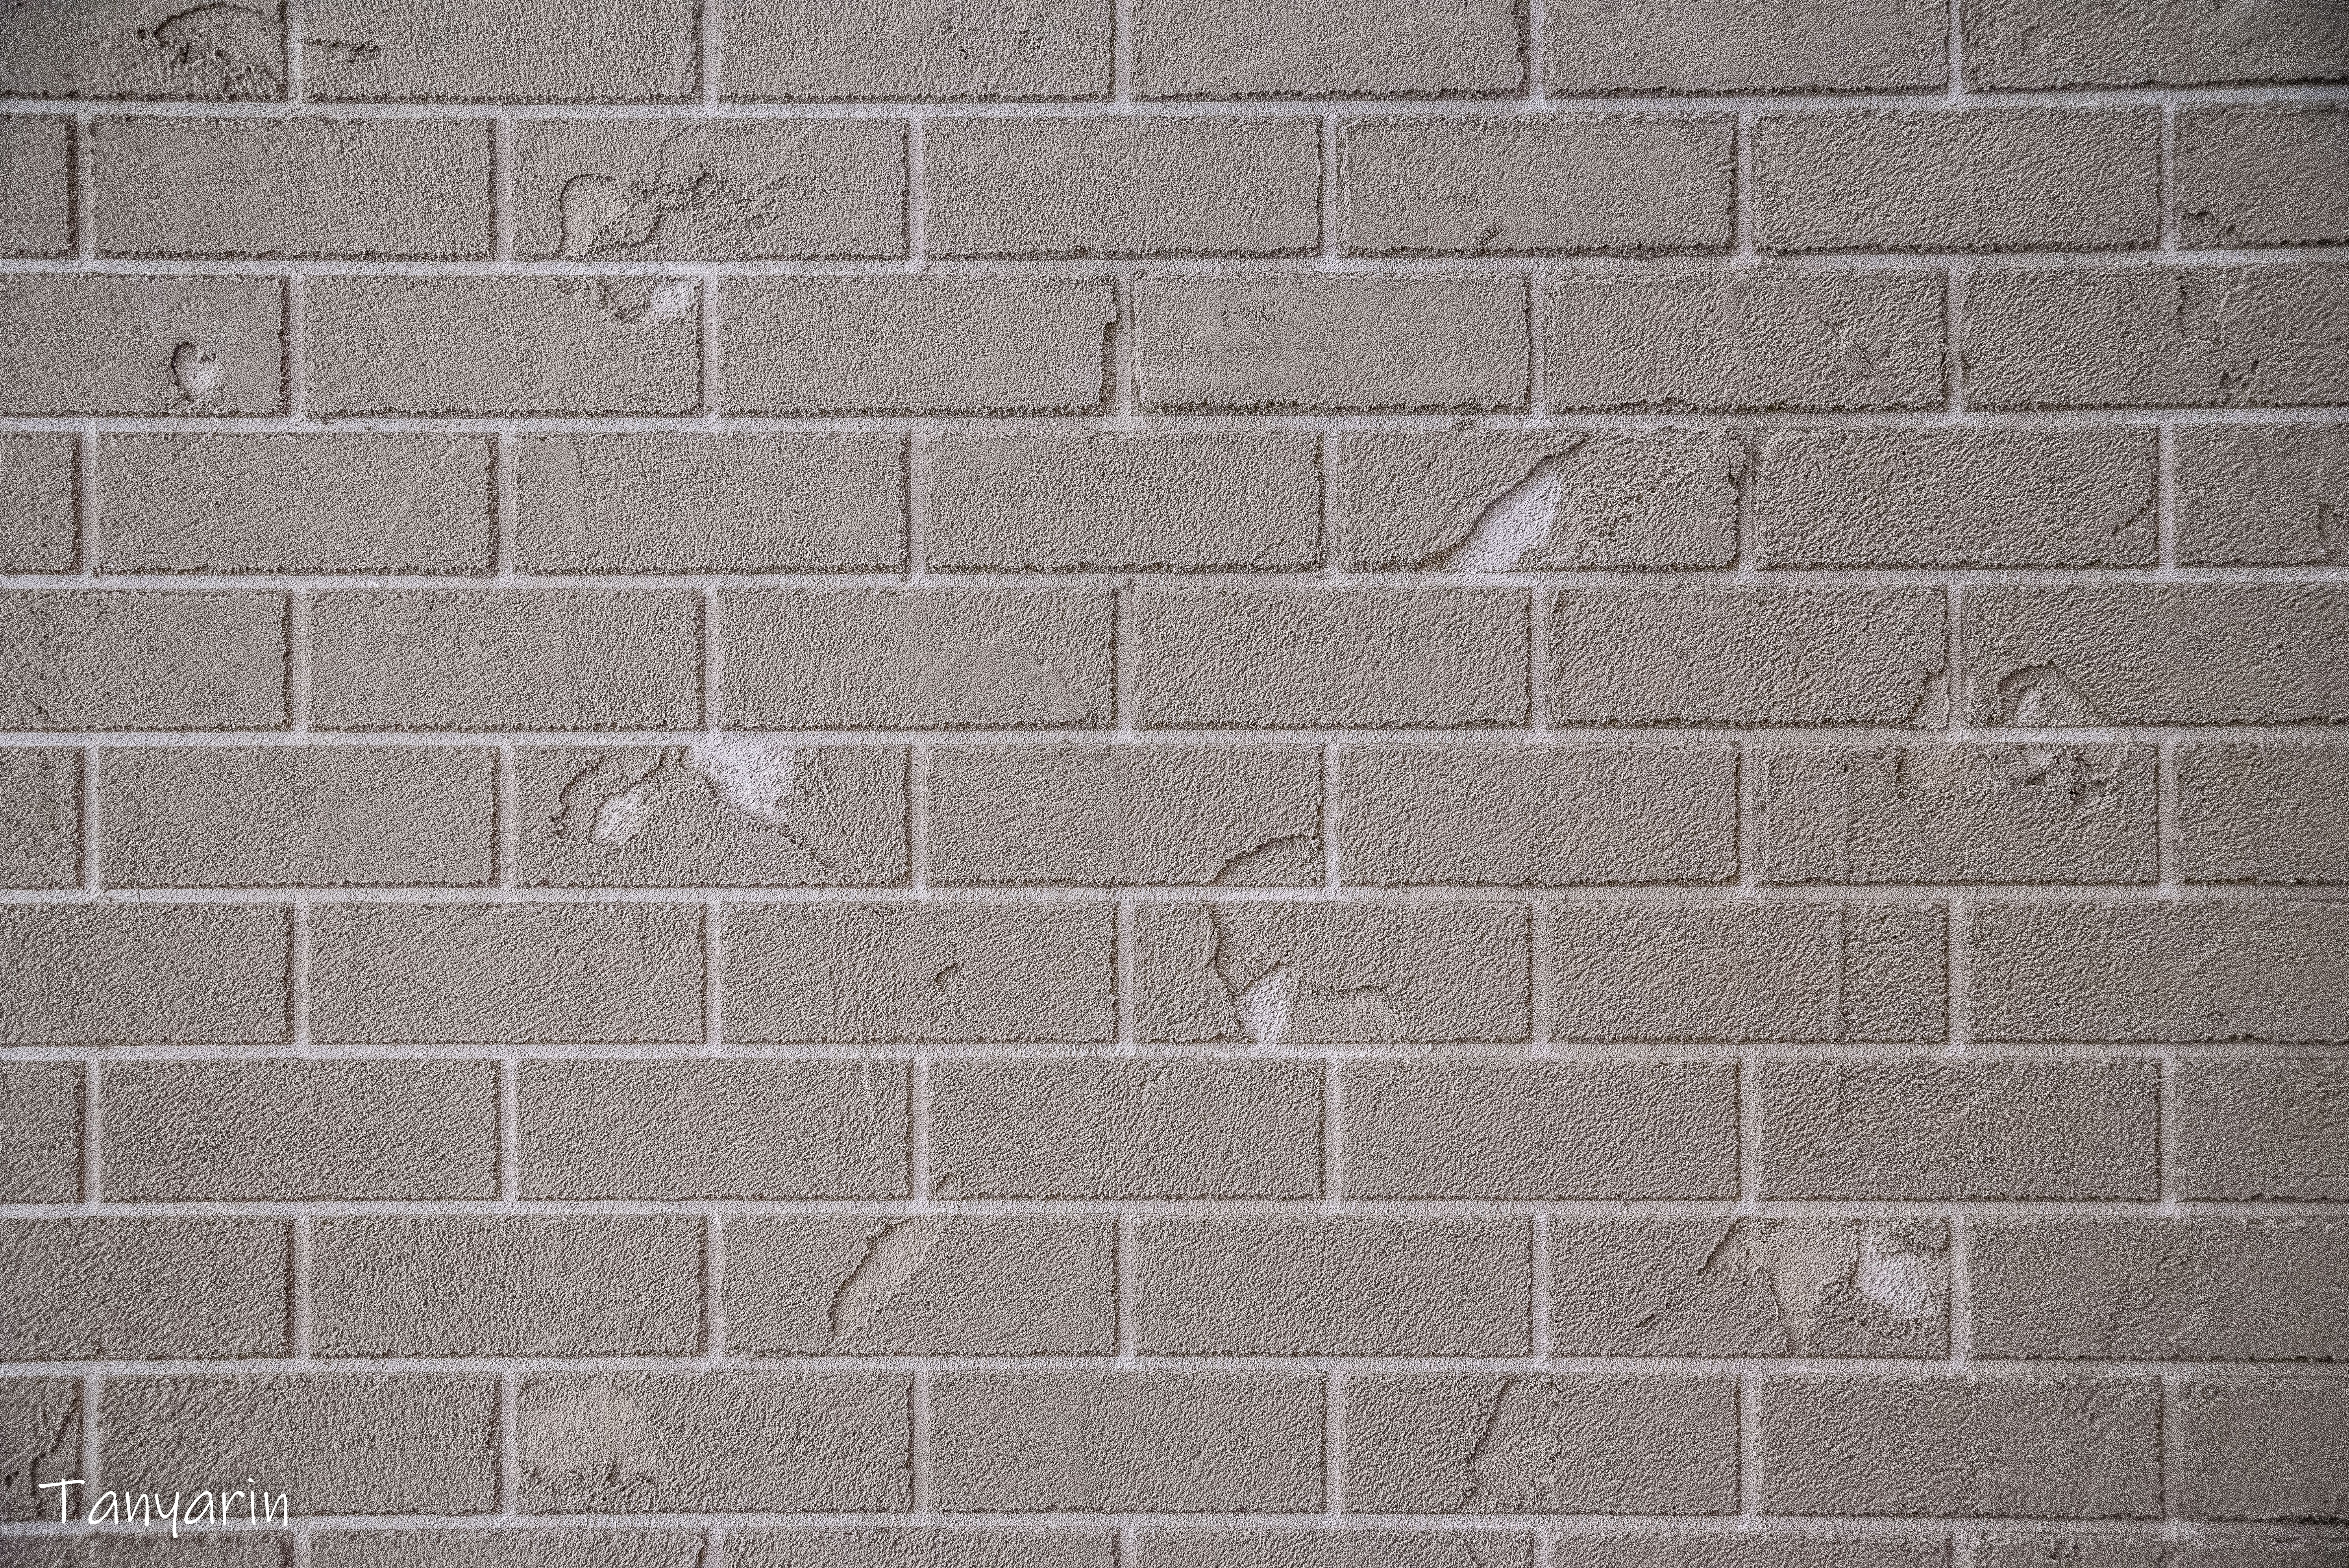 Brick Stucco On Wall By Tanyarin